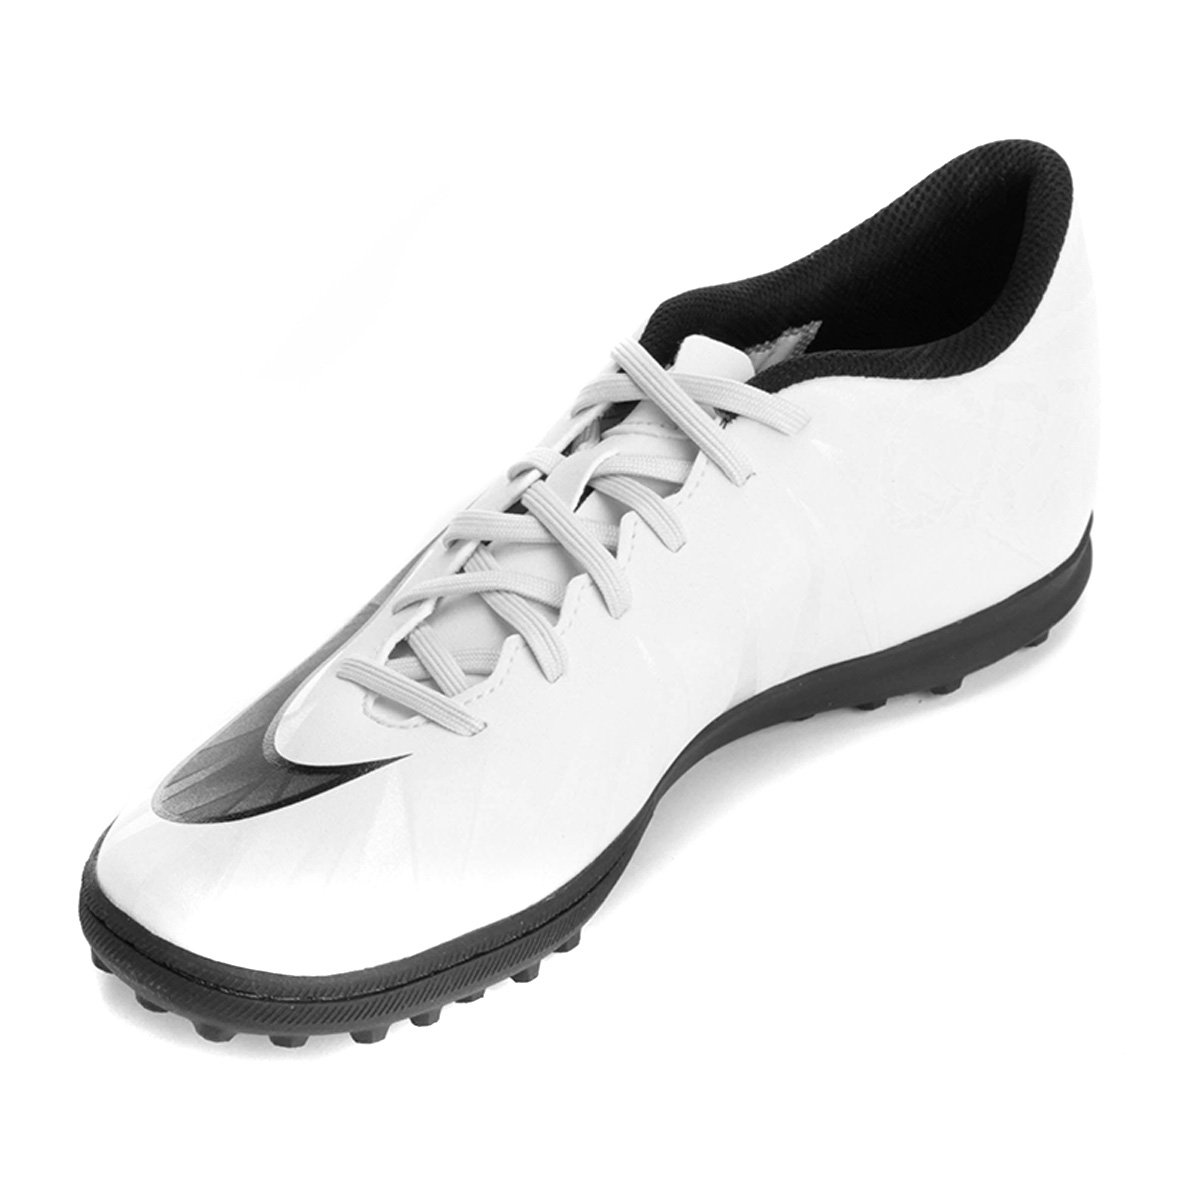 Chuteira Society Nike Mercurial X Vortex 3 CR7 TF - Compre Agora ... 6b1f0e023bf43